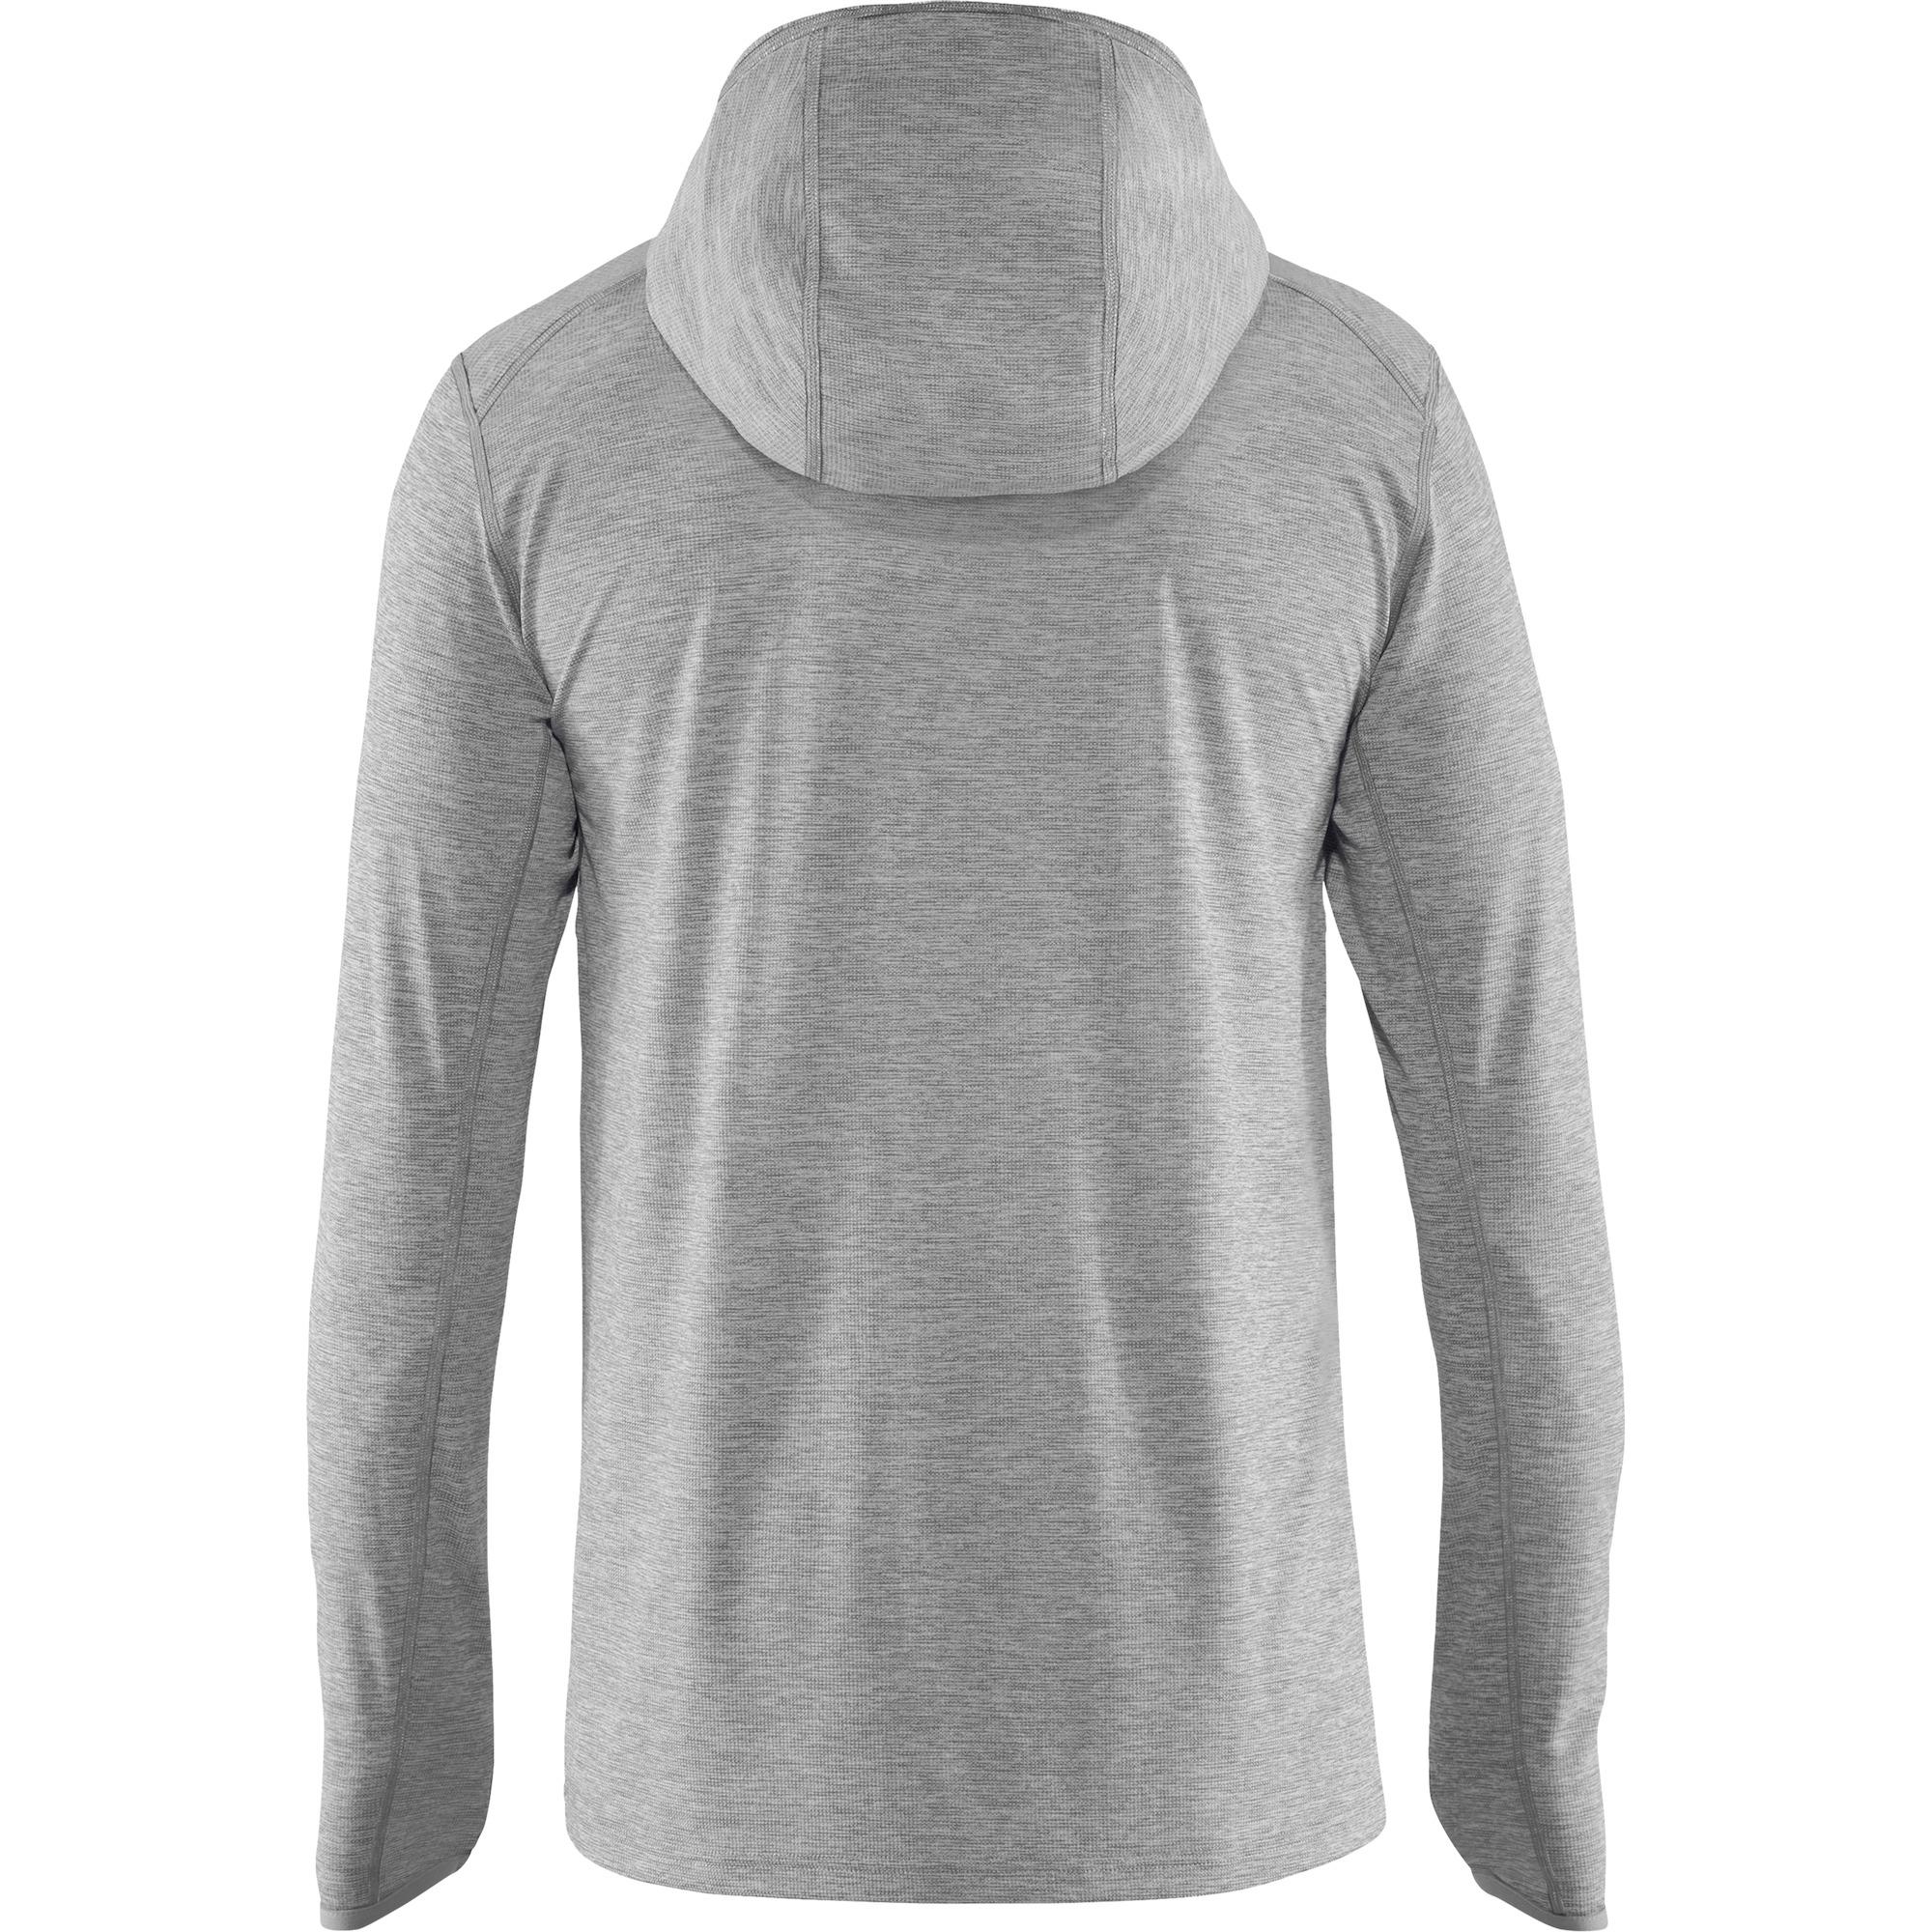 Live Every Week Like Shark Black Hooded Sweatshirt for Women Long Sleeve